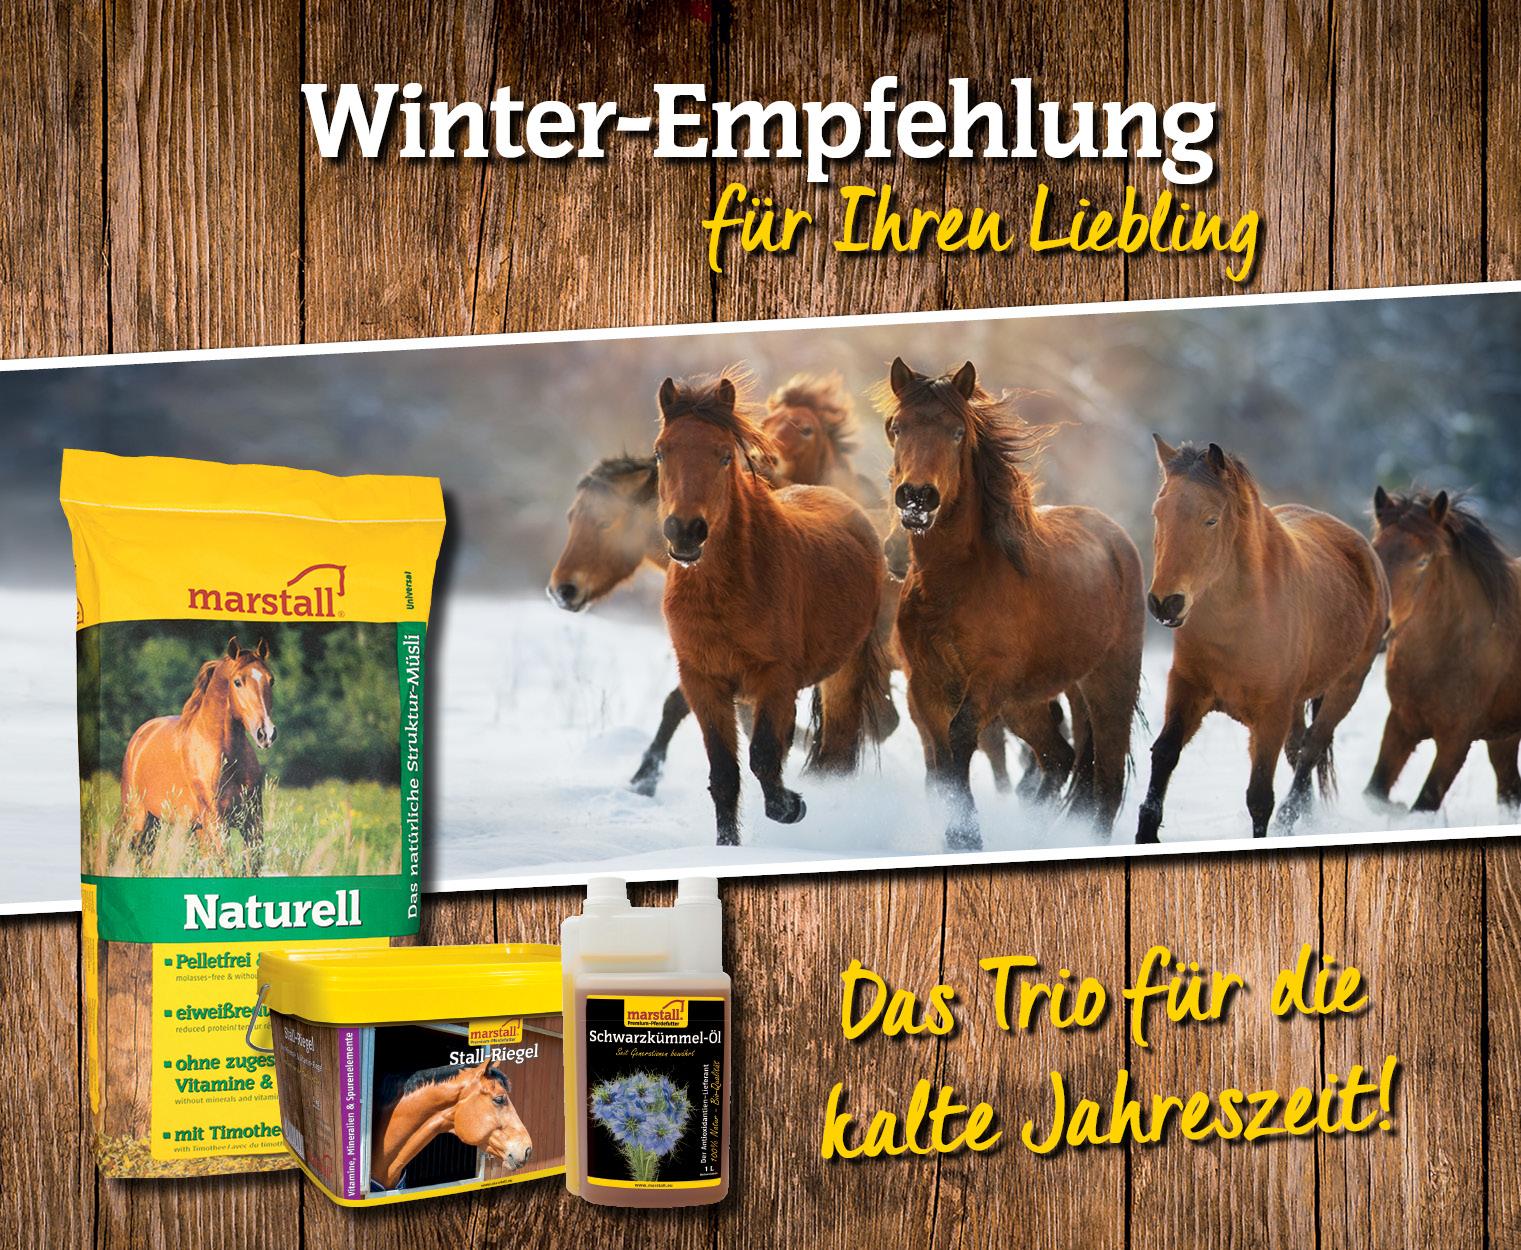 Winter-Empfehlung: marstall Aktion 1/20